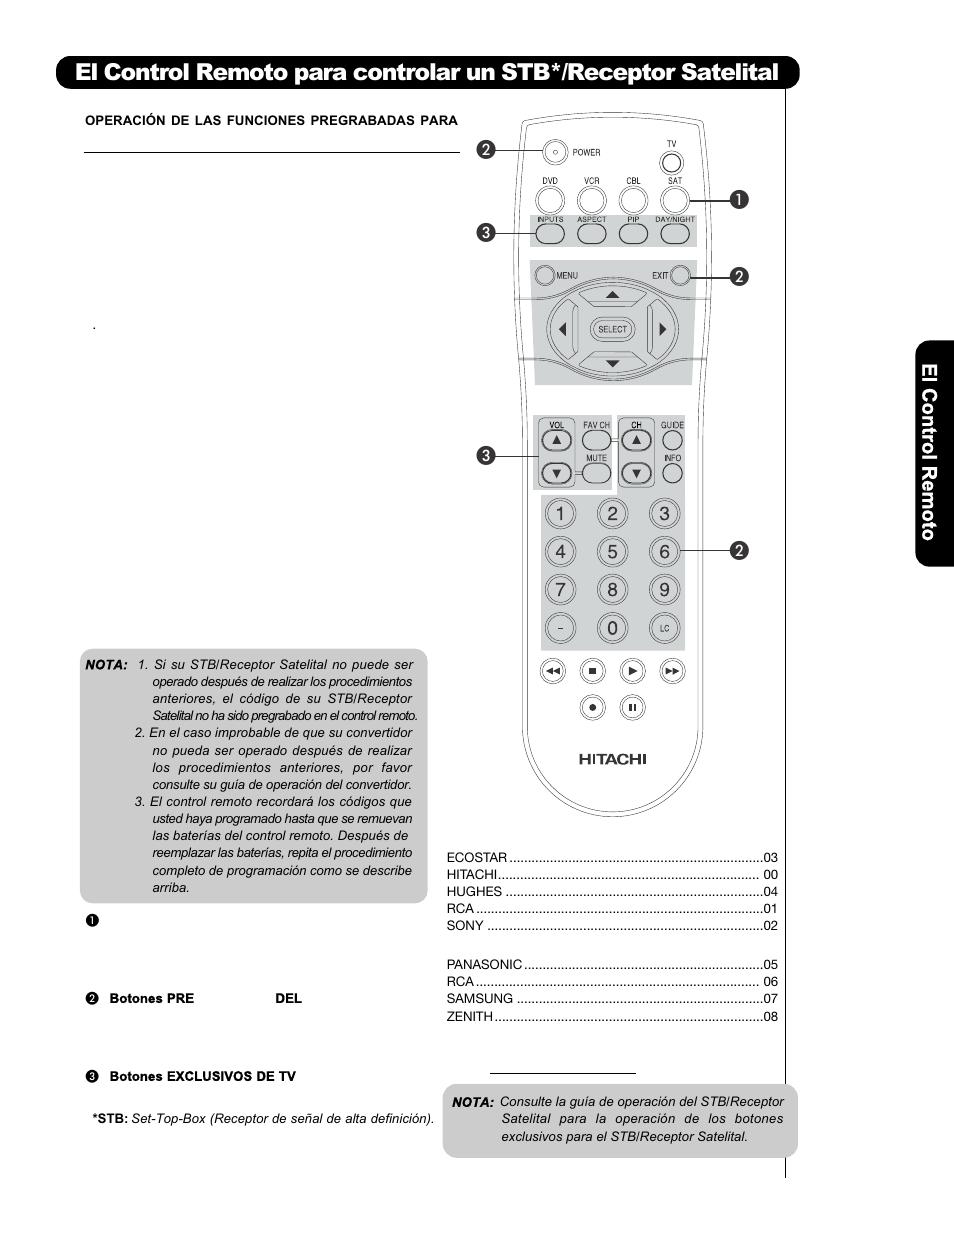 hitachi p50h401 user manual page 93 144 original mode also rh manualsdir com Hitachi Repair Manual Hitachi Manuals Television